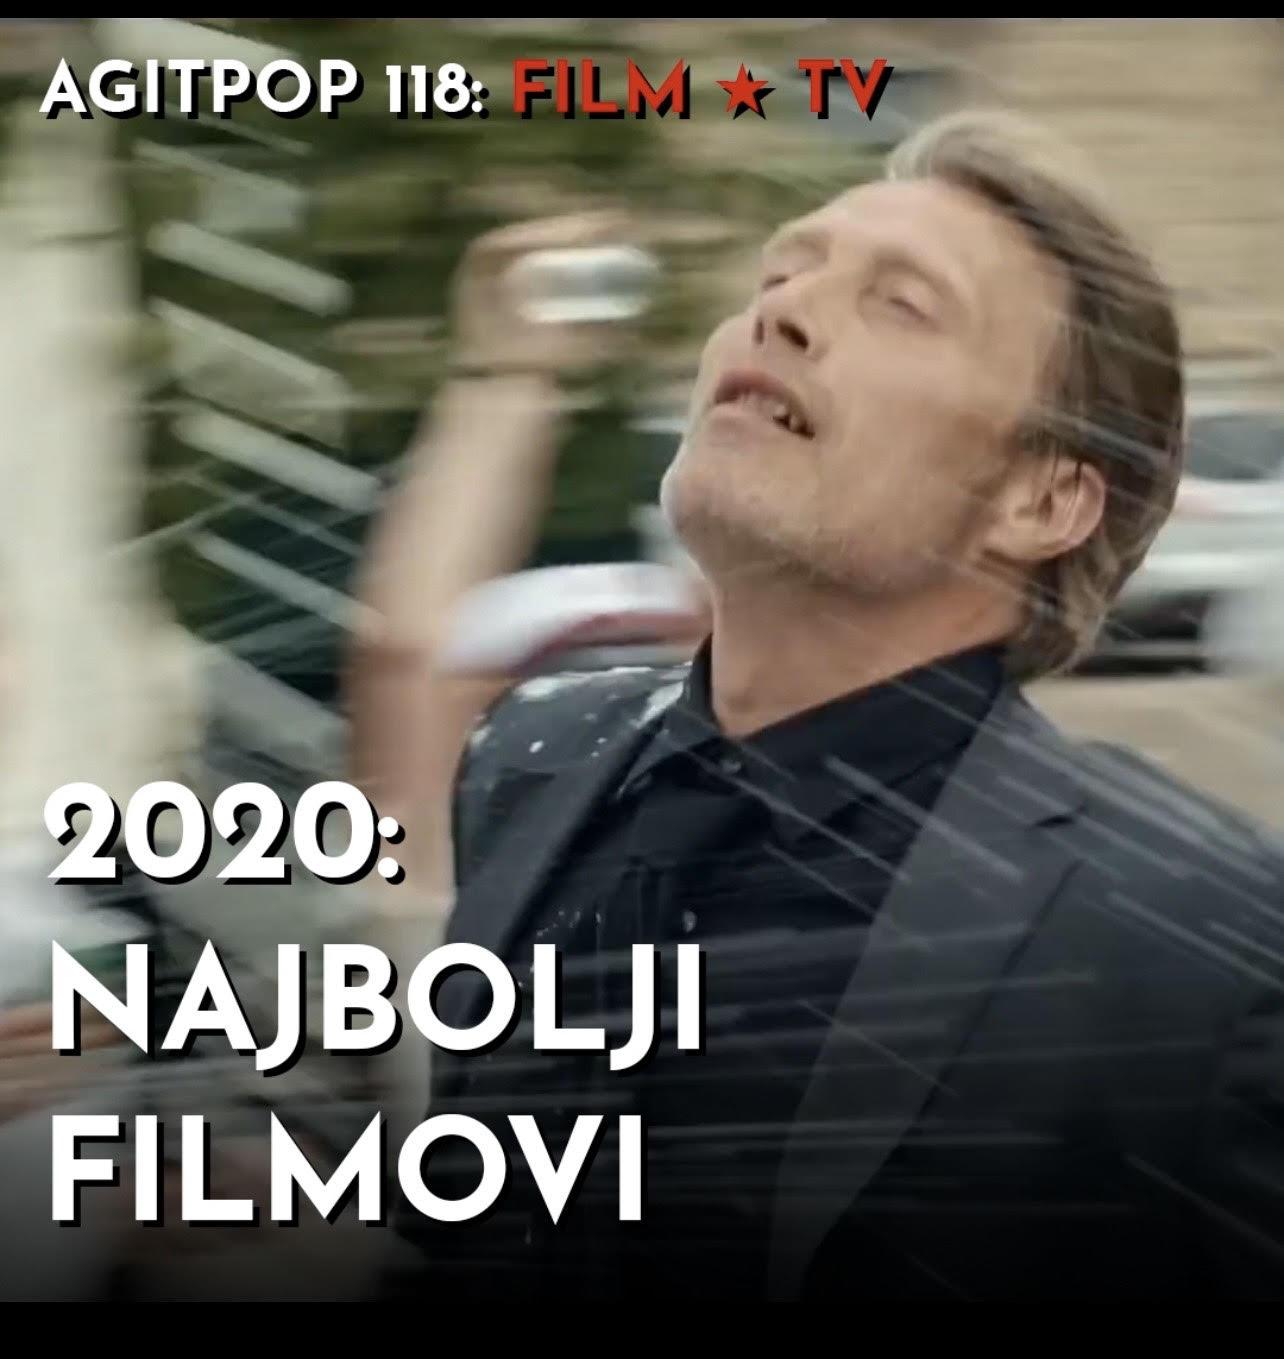 Agitpop 118: 2020 - Najbolji filmovi